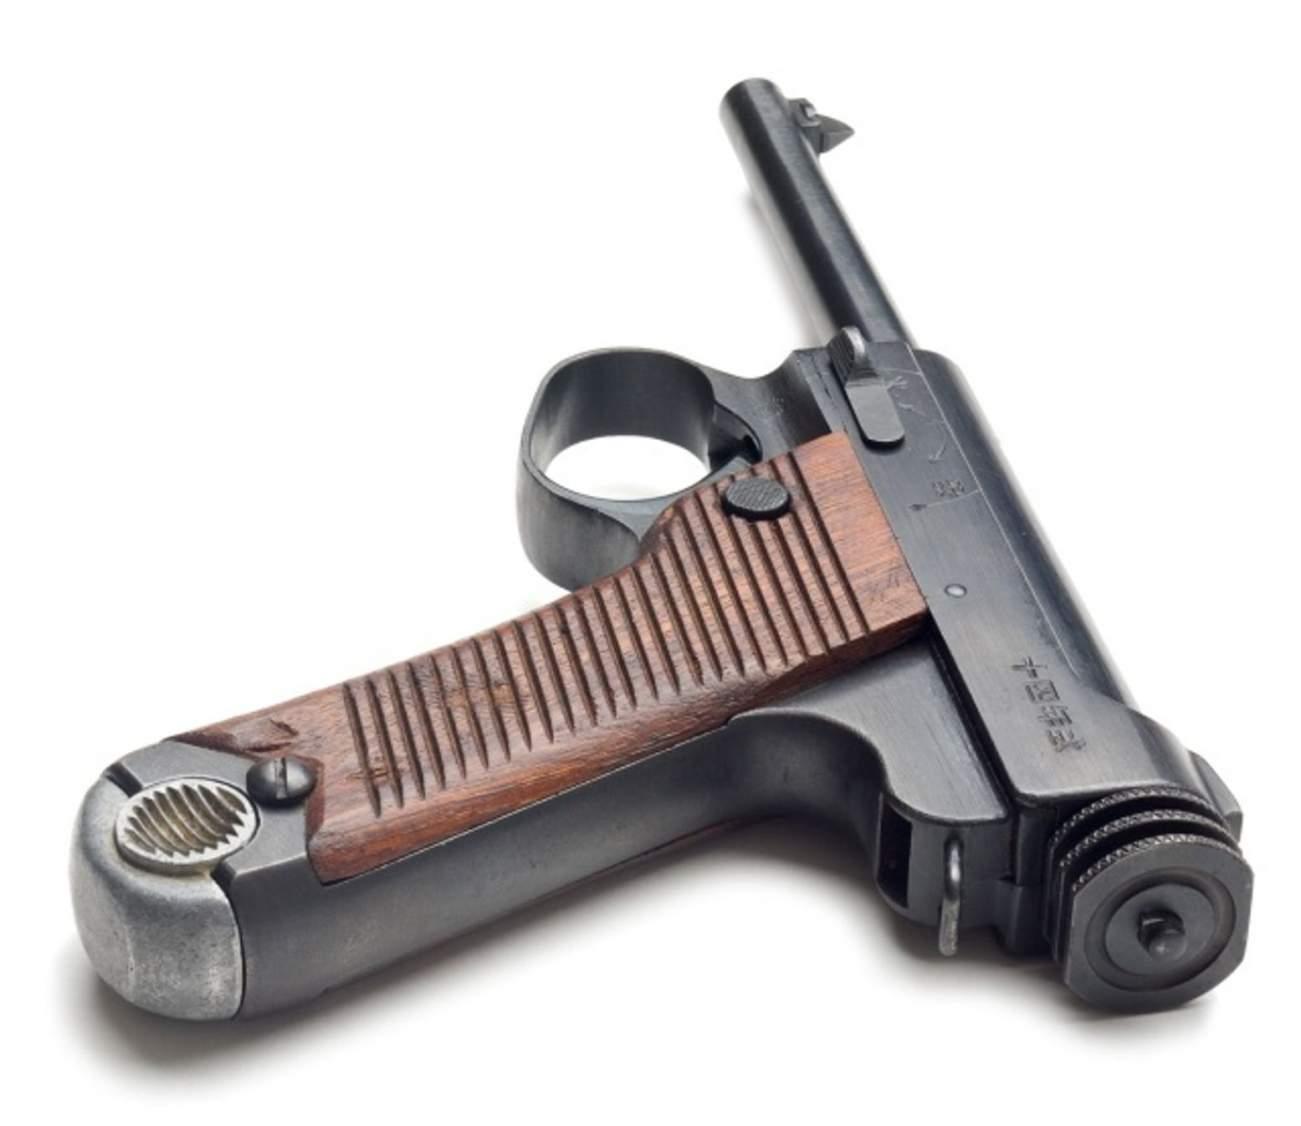 https://en.wikipedia.org/wiki/Nambu_pistol#/media/File:Nambu2470.jpg